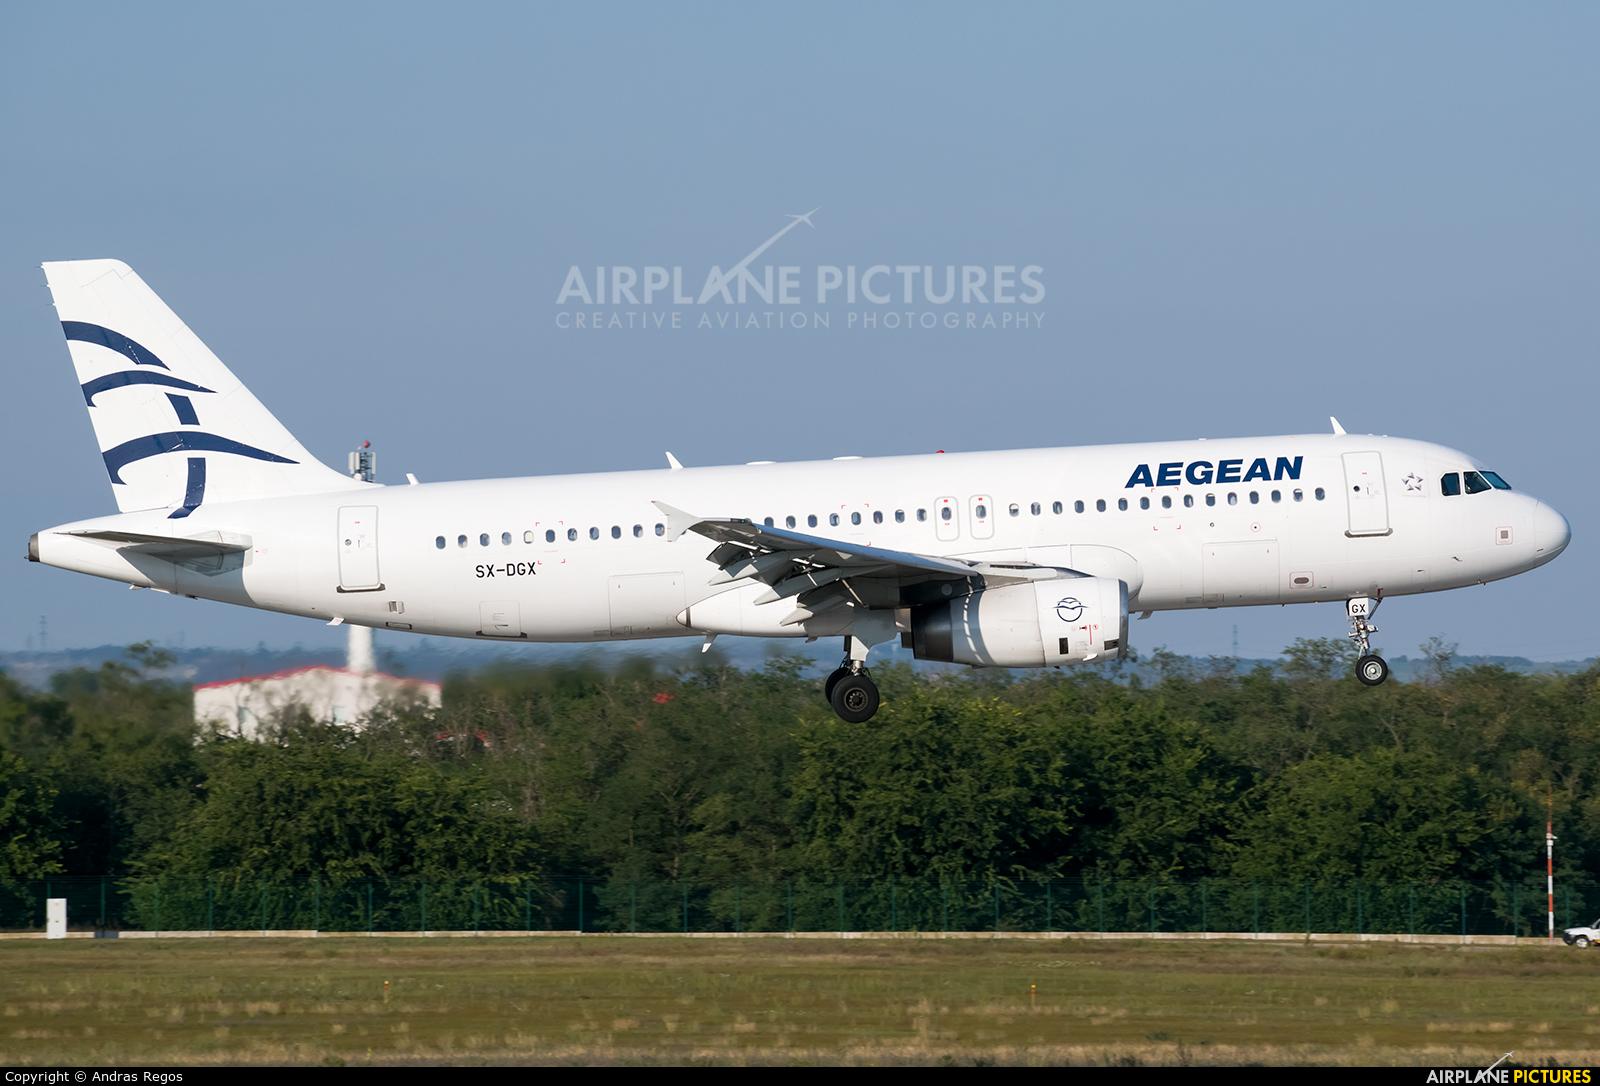 Aegean Airlines SX-DGX aircraft at Budapest Ferenc Liszt International Airport